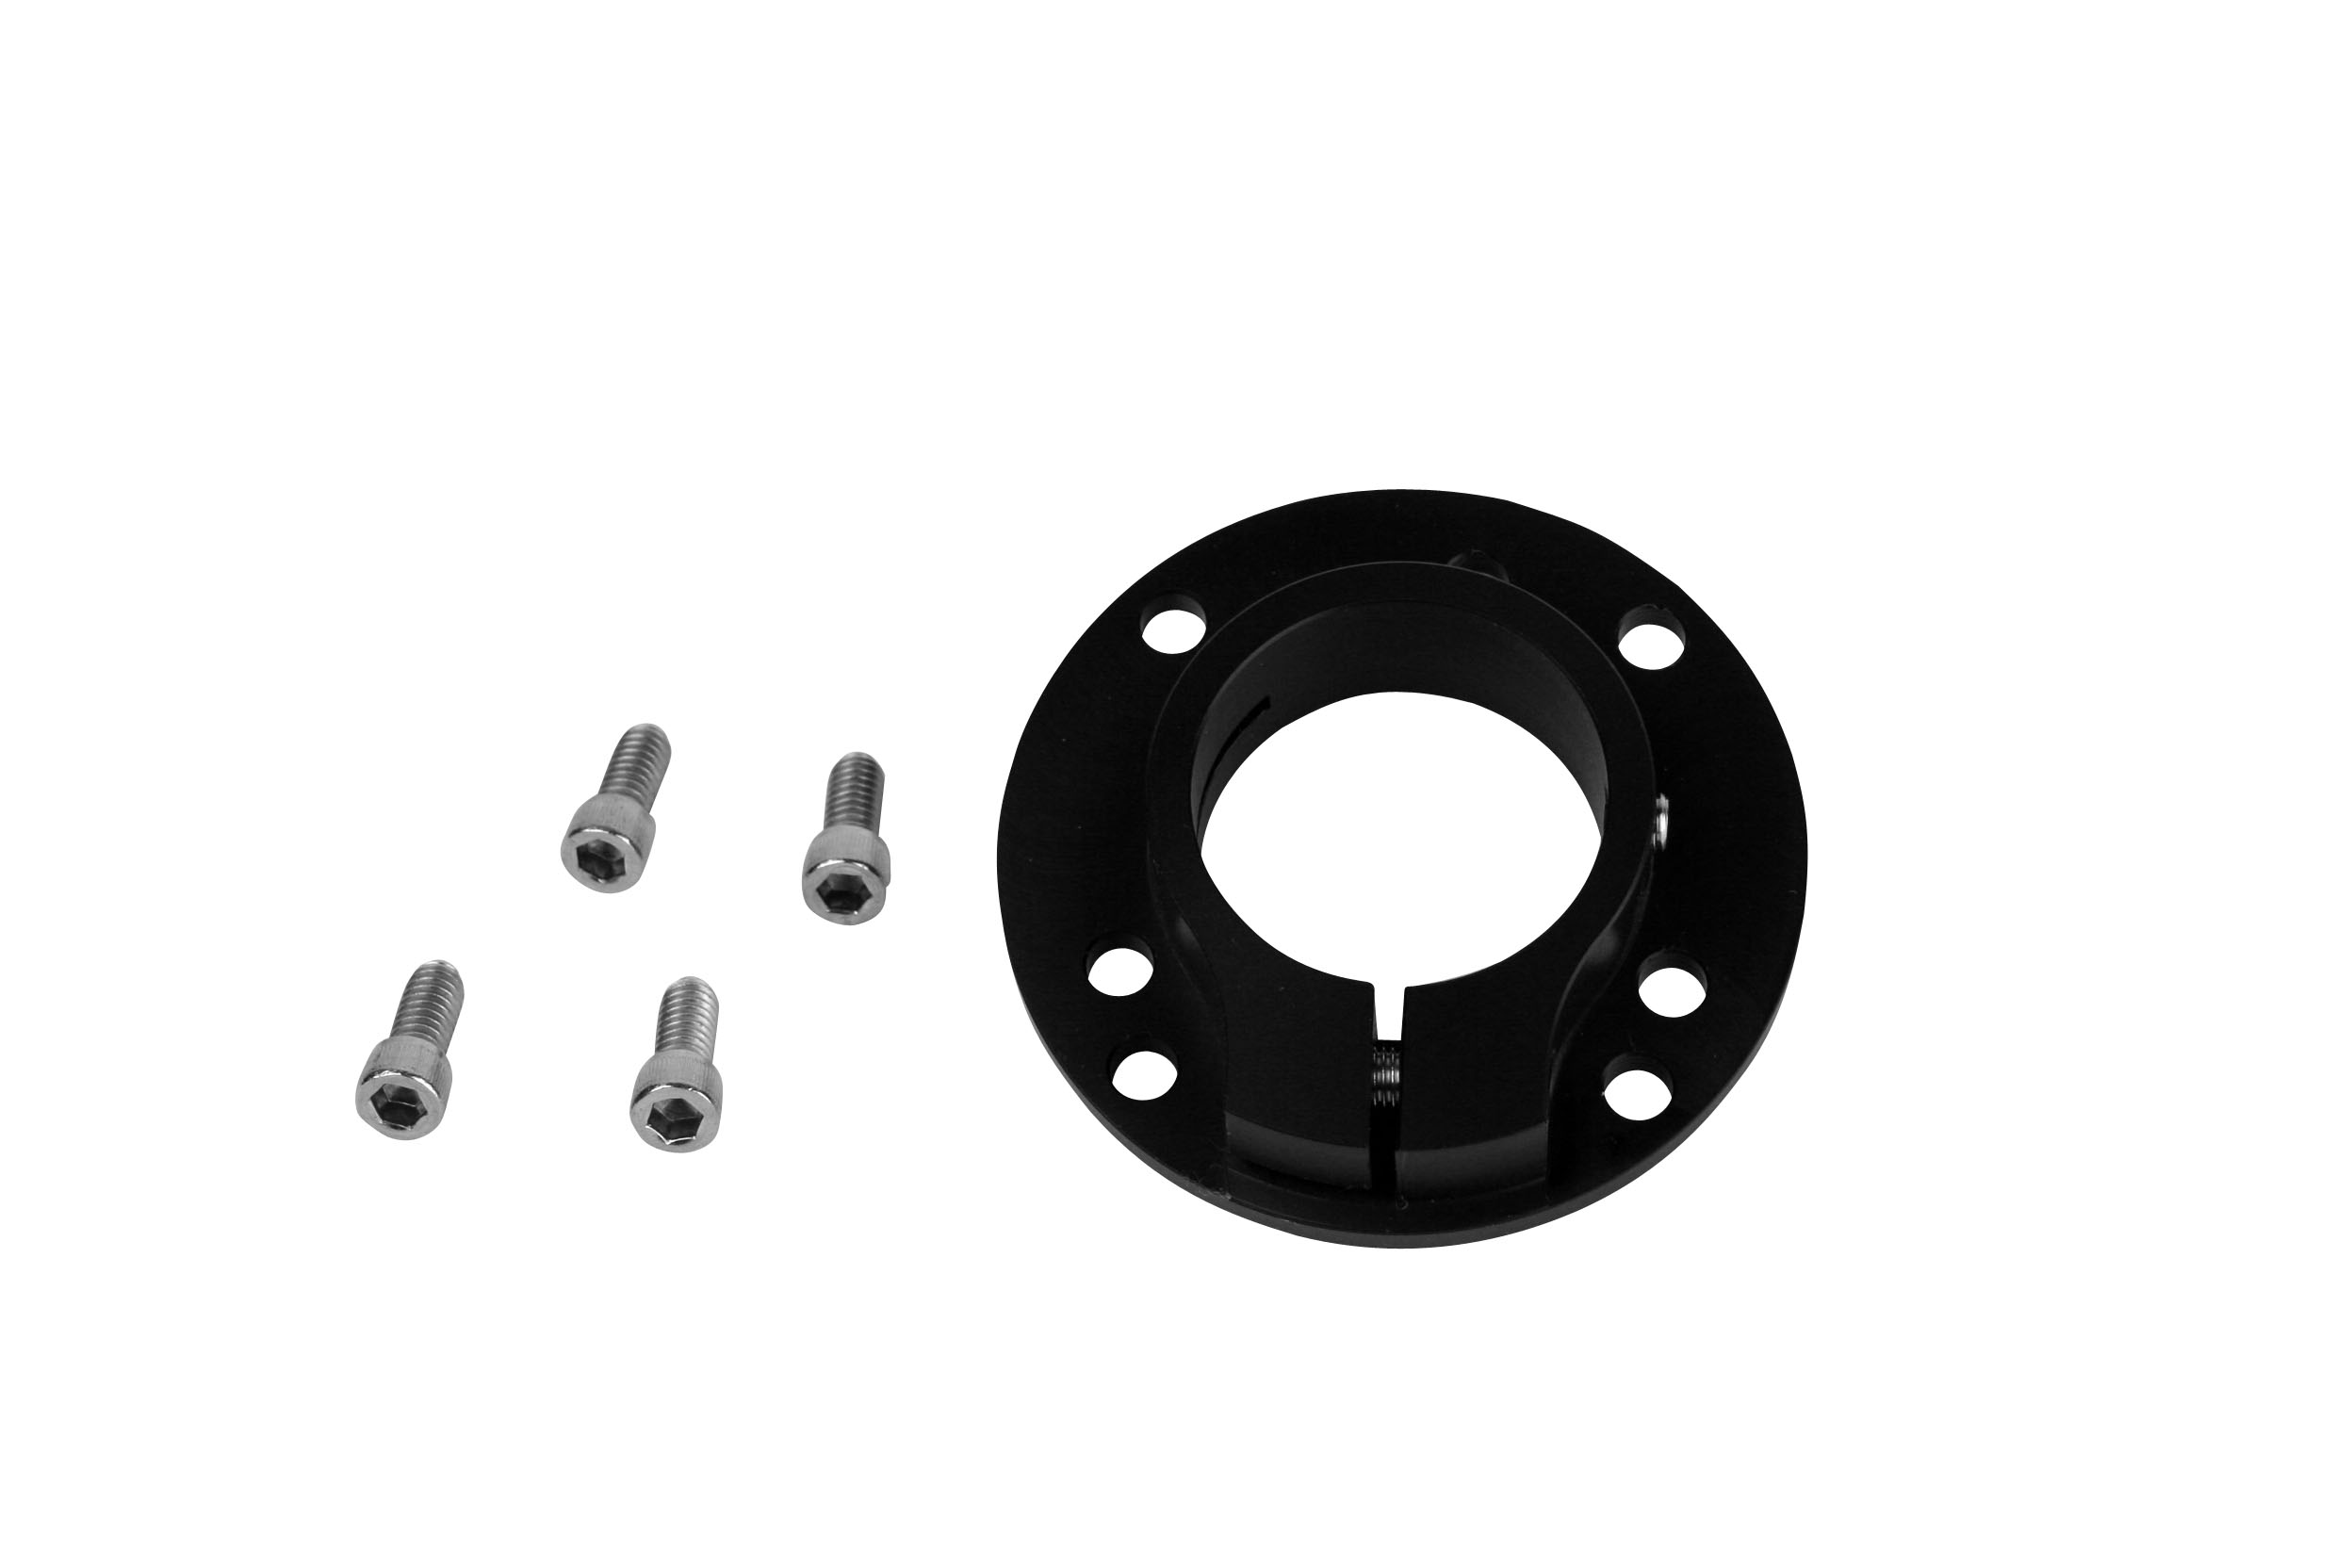 Aeromotive 11736 Fuel Pressure Sensor Adapter